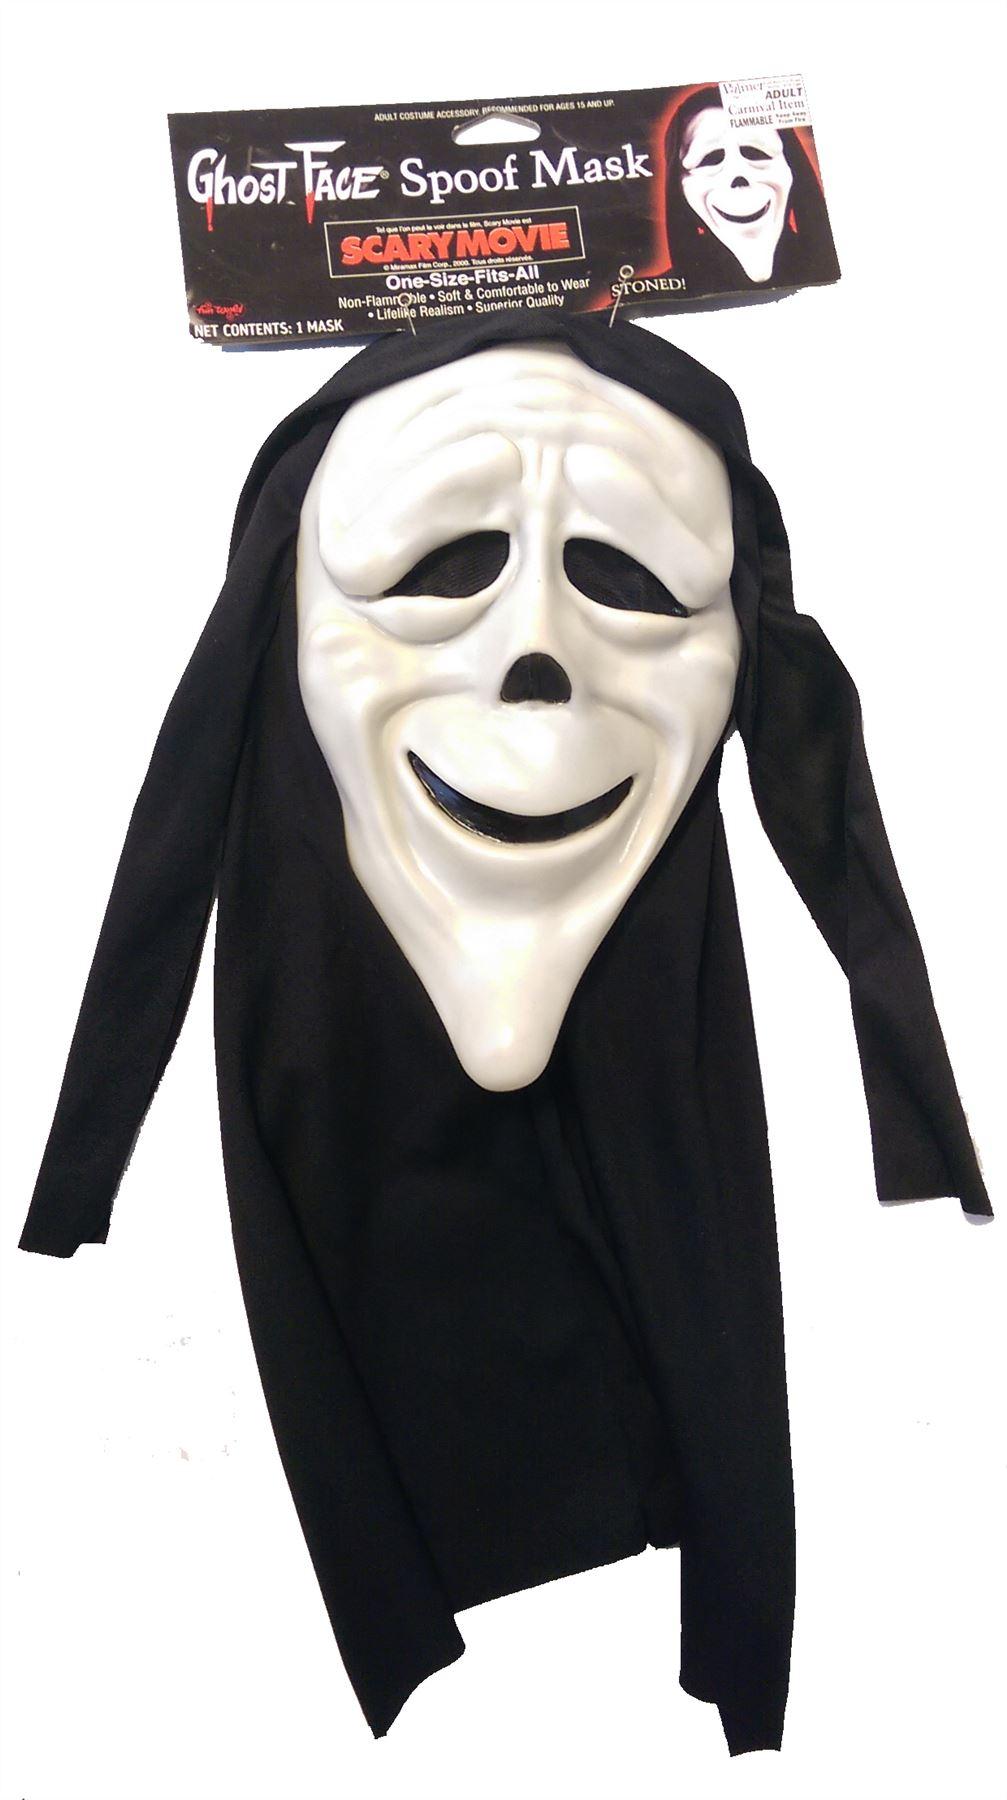 Scream scary movie licenced masks halloween fancy dress ebay - Deguisement film d horreur ...